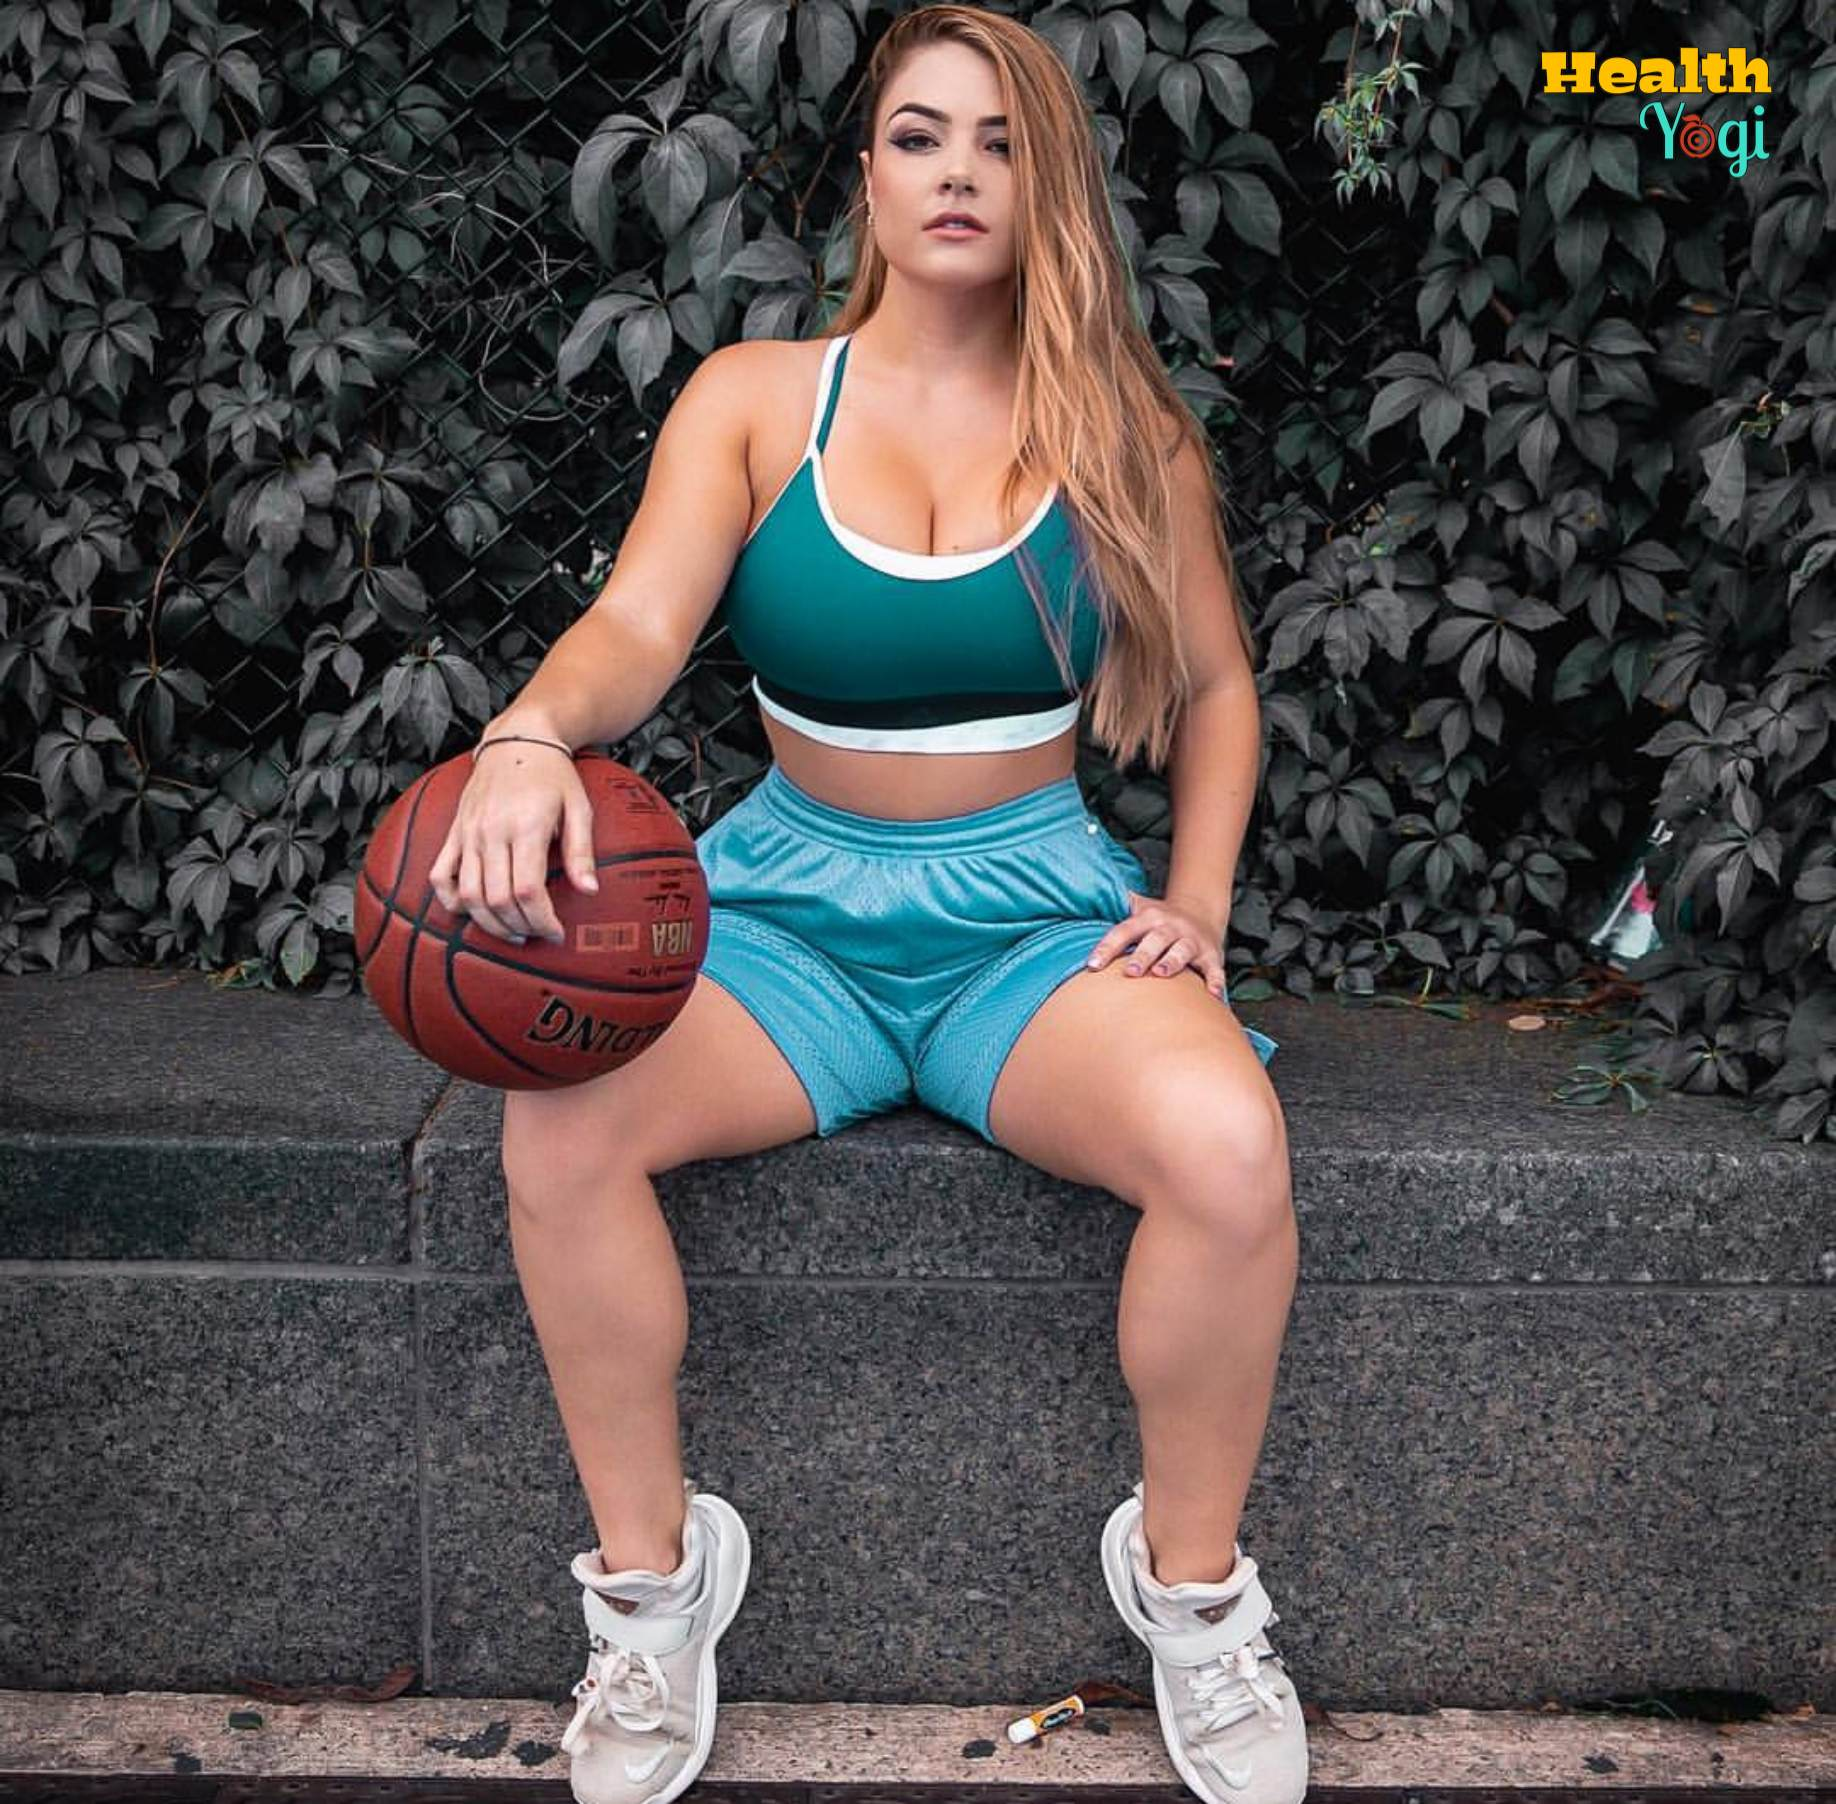 Jem Wolfie Diet Plan and Workout Routine